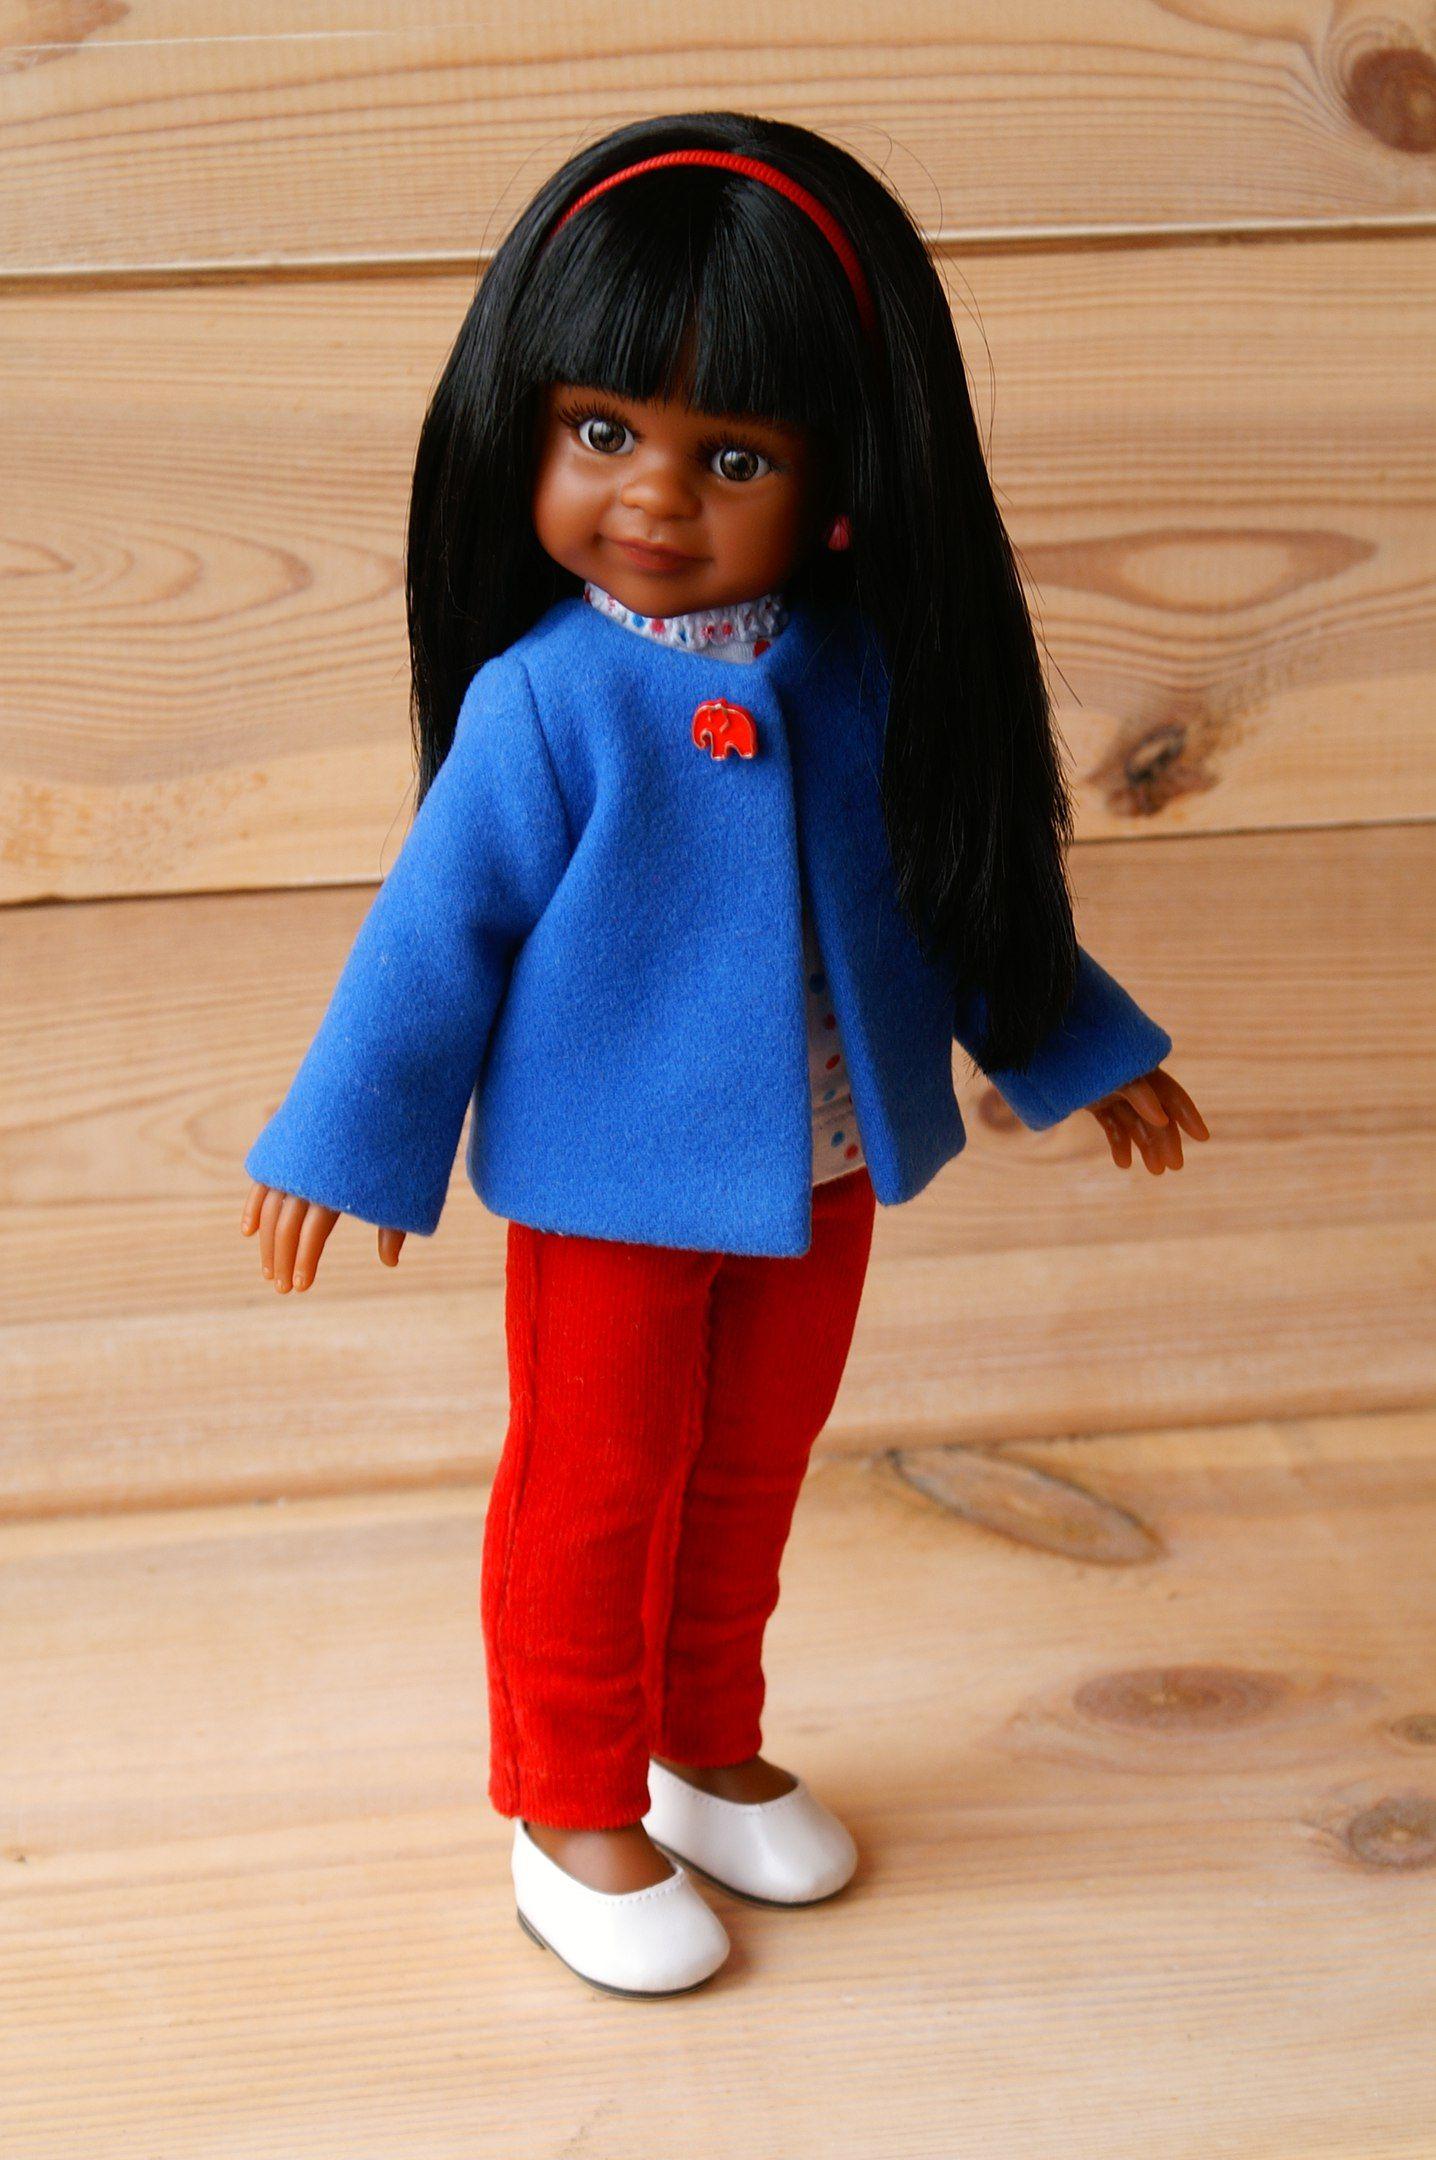 Испанские куклы Paola Reina   Куклы, Испанский